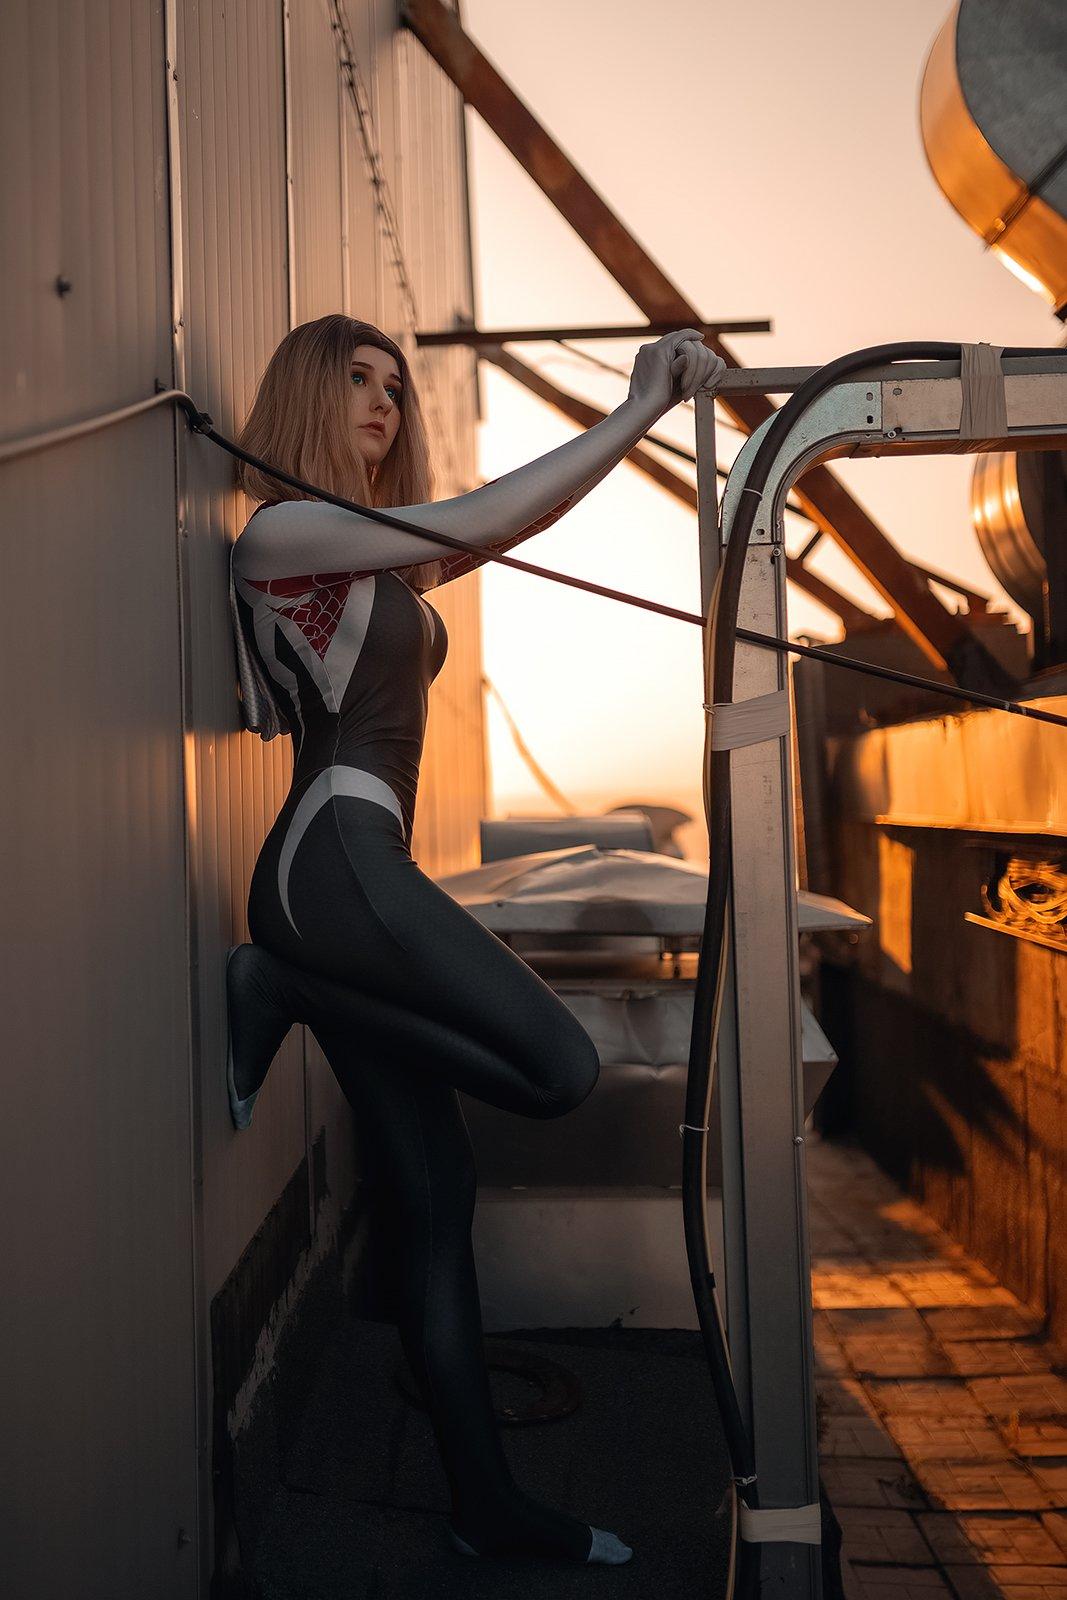 косплей, cosplay, человекпаук, spiderman, Ярилин Сергей